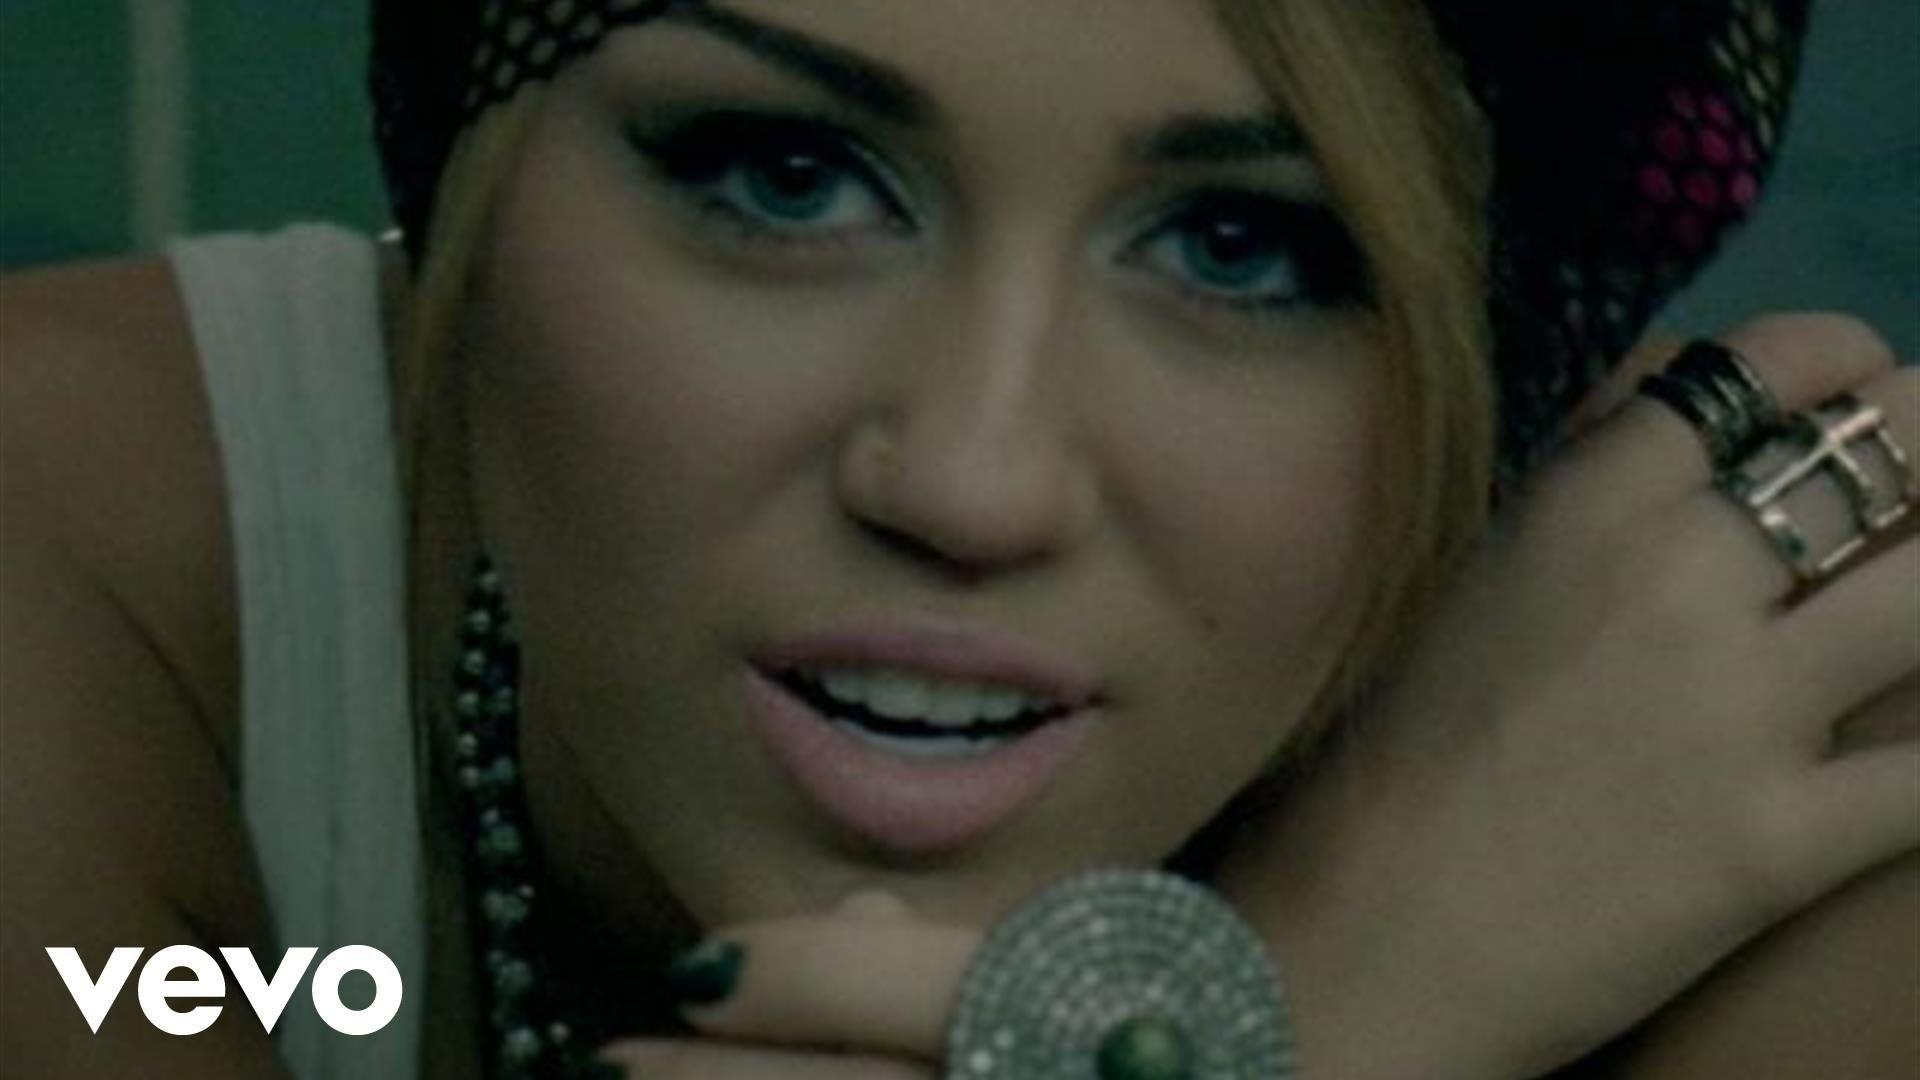 Miley Cyrus Miley Cyrus Songs Miley Cyrus Hollywood Records